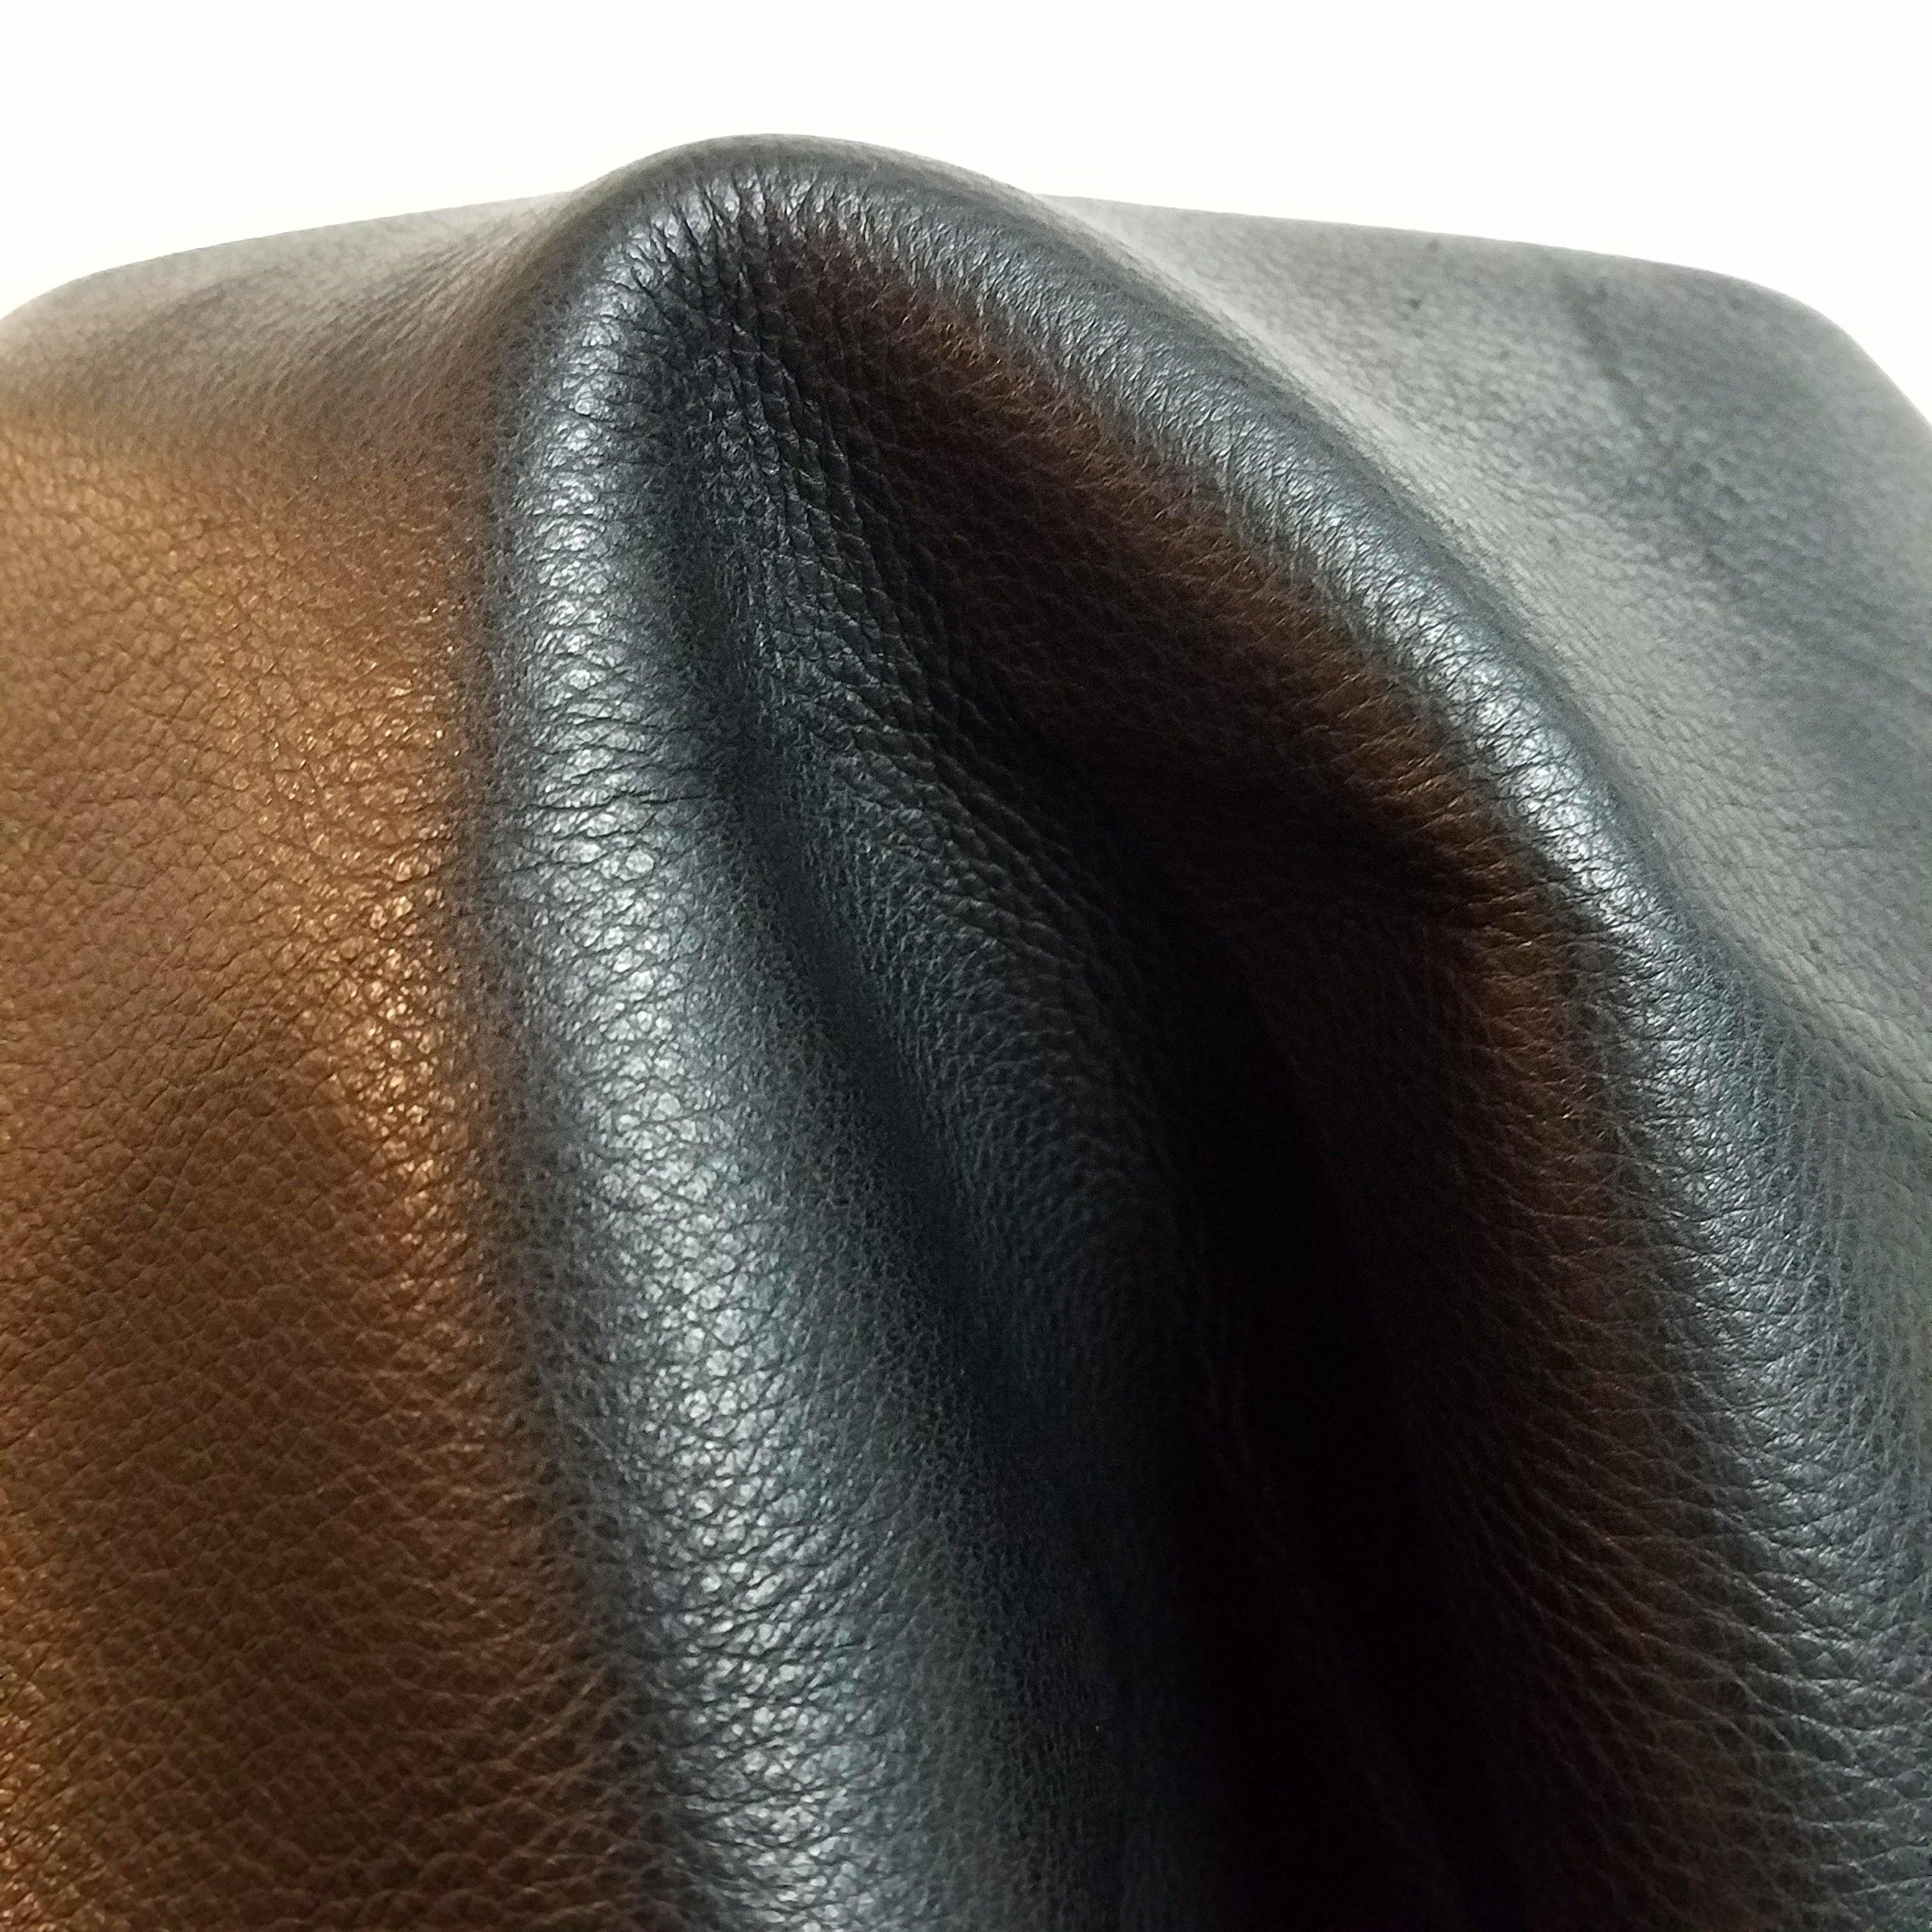 Black B Grade 18-22 sq.ft. Quality Aniline Soft Cowhide Hide Skin Genuine Leather Aniline Naked Natural Tumbled 2.5-3.0 Oz.